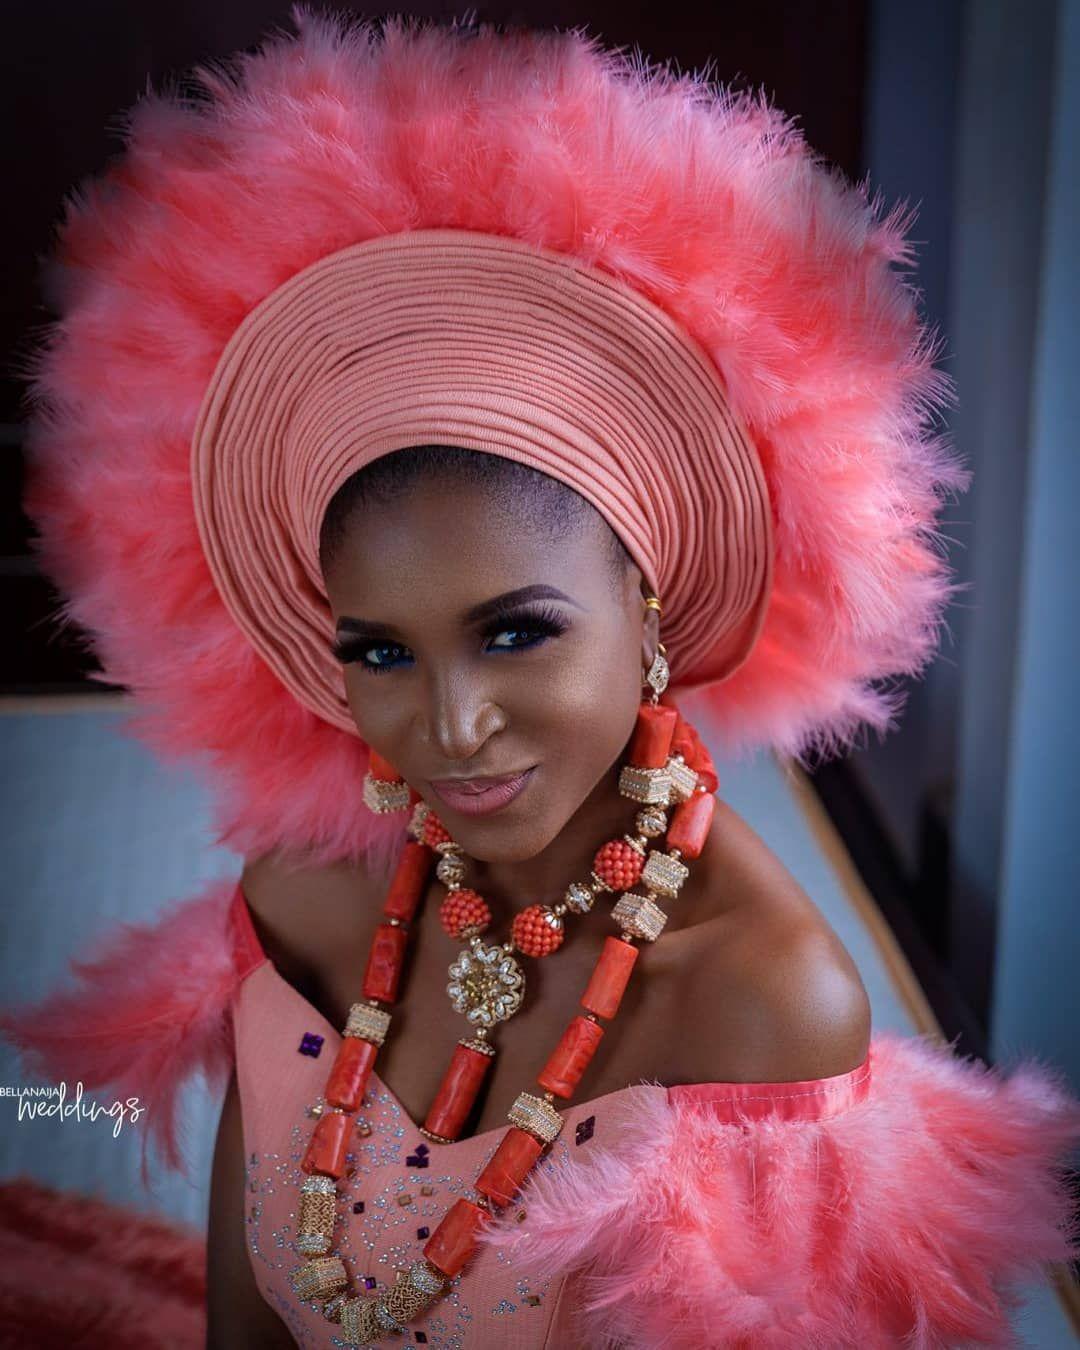 Emmanuelsblog Weddings Top 9 Bridal Beauty Looks of 2018 #nigeriandressstyles